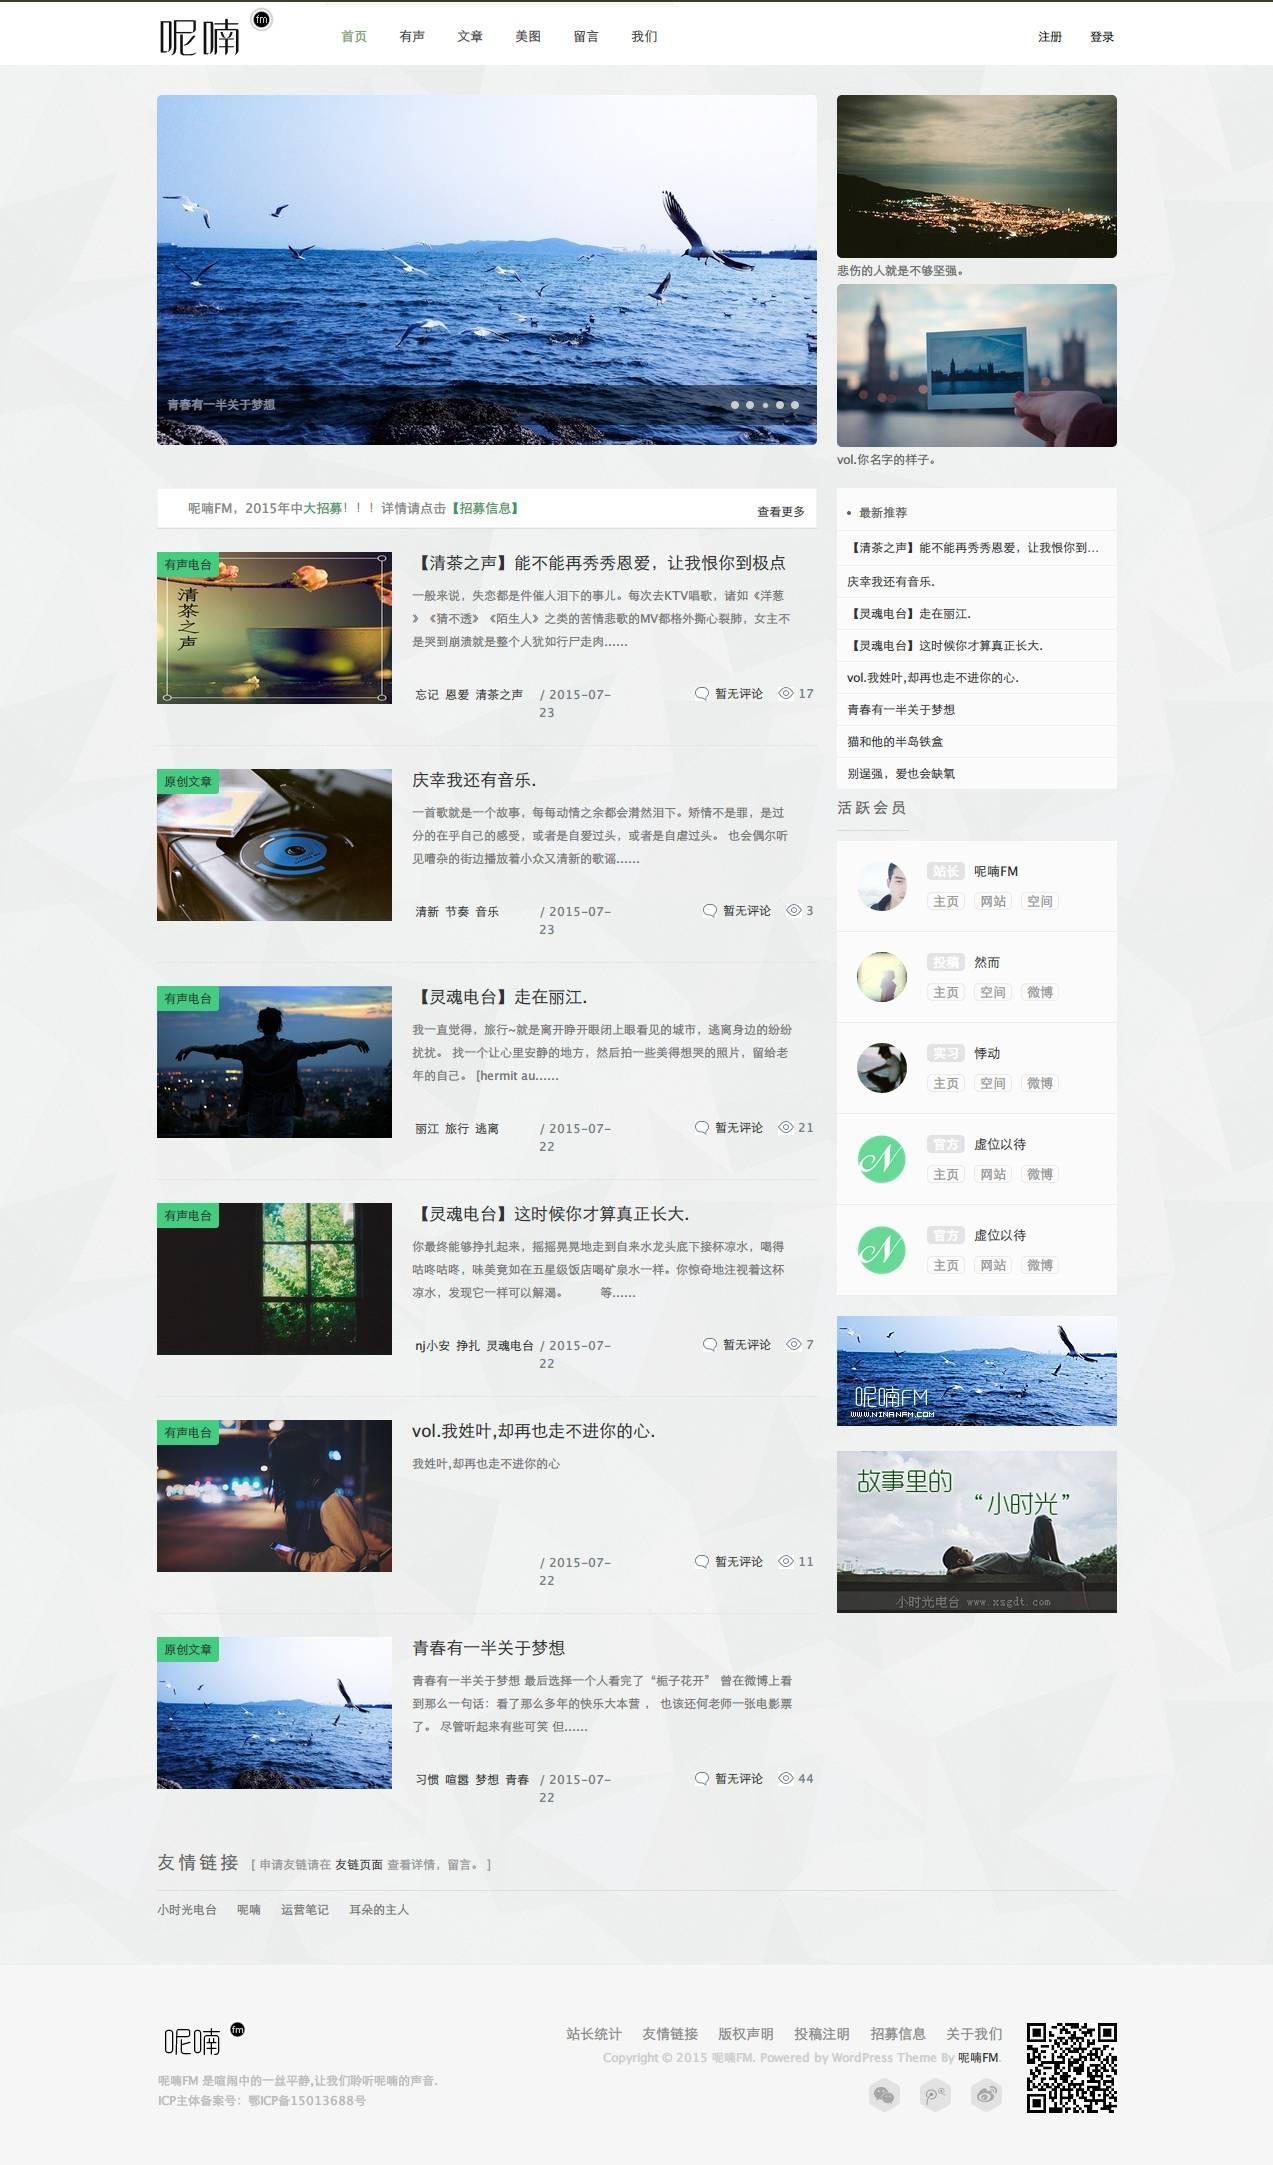 wordpress Ninanfm简灰博客主题